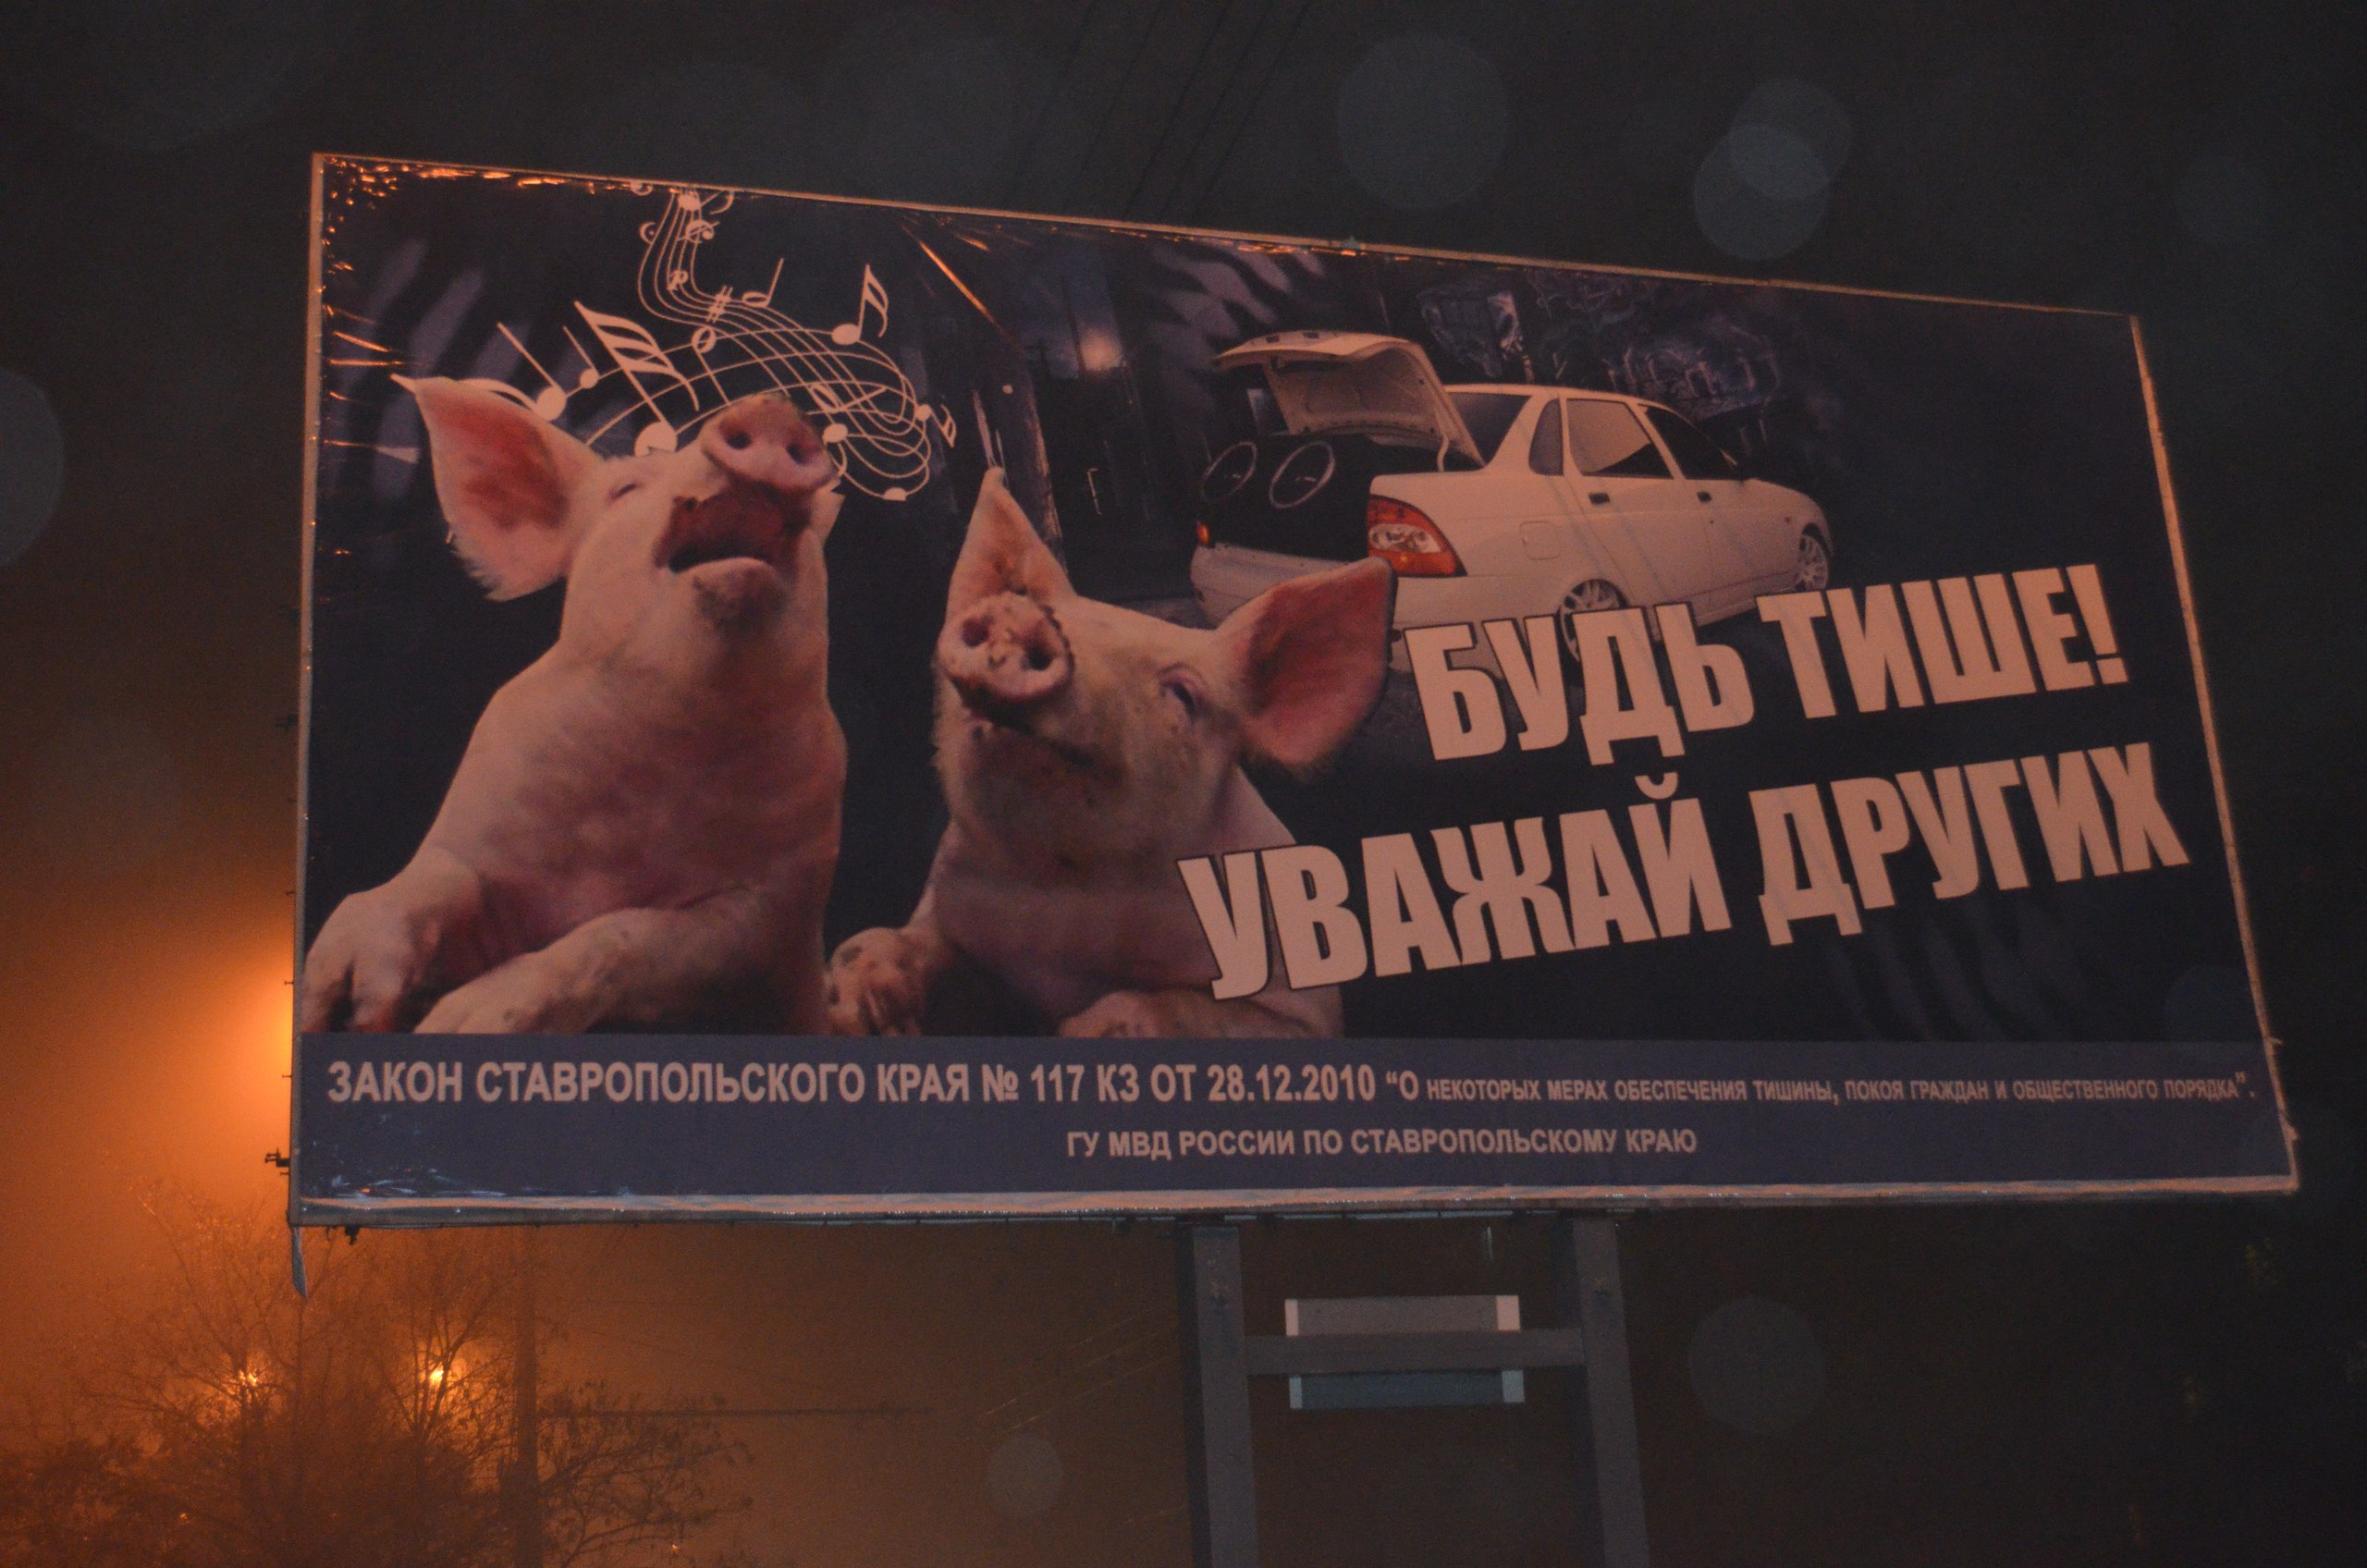 знакомства оренбург на один раз без регистрации